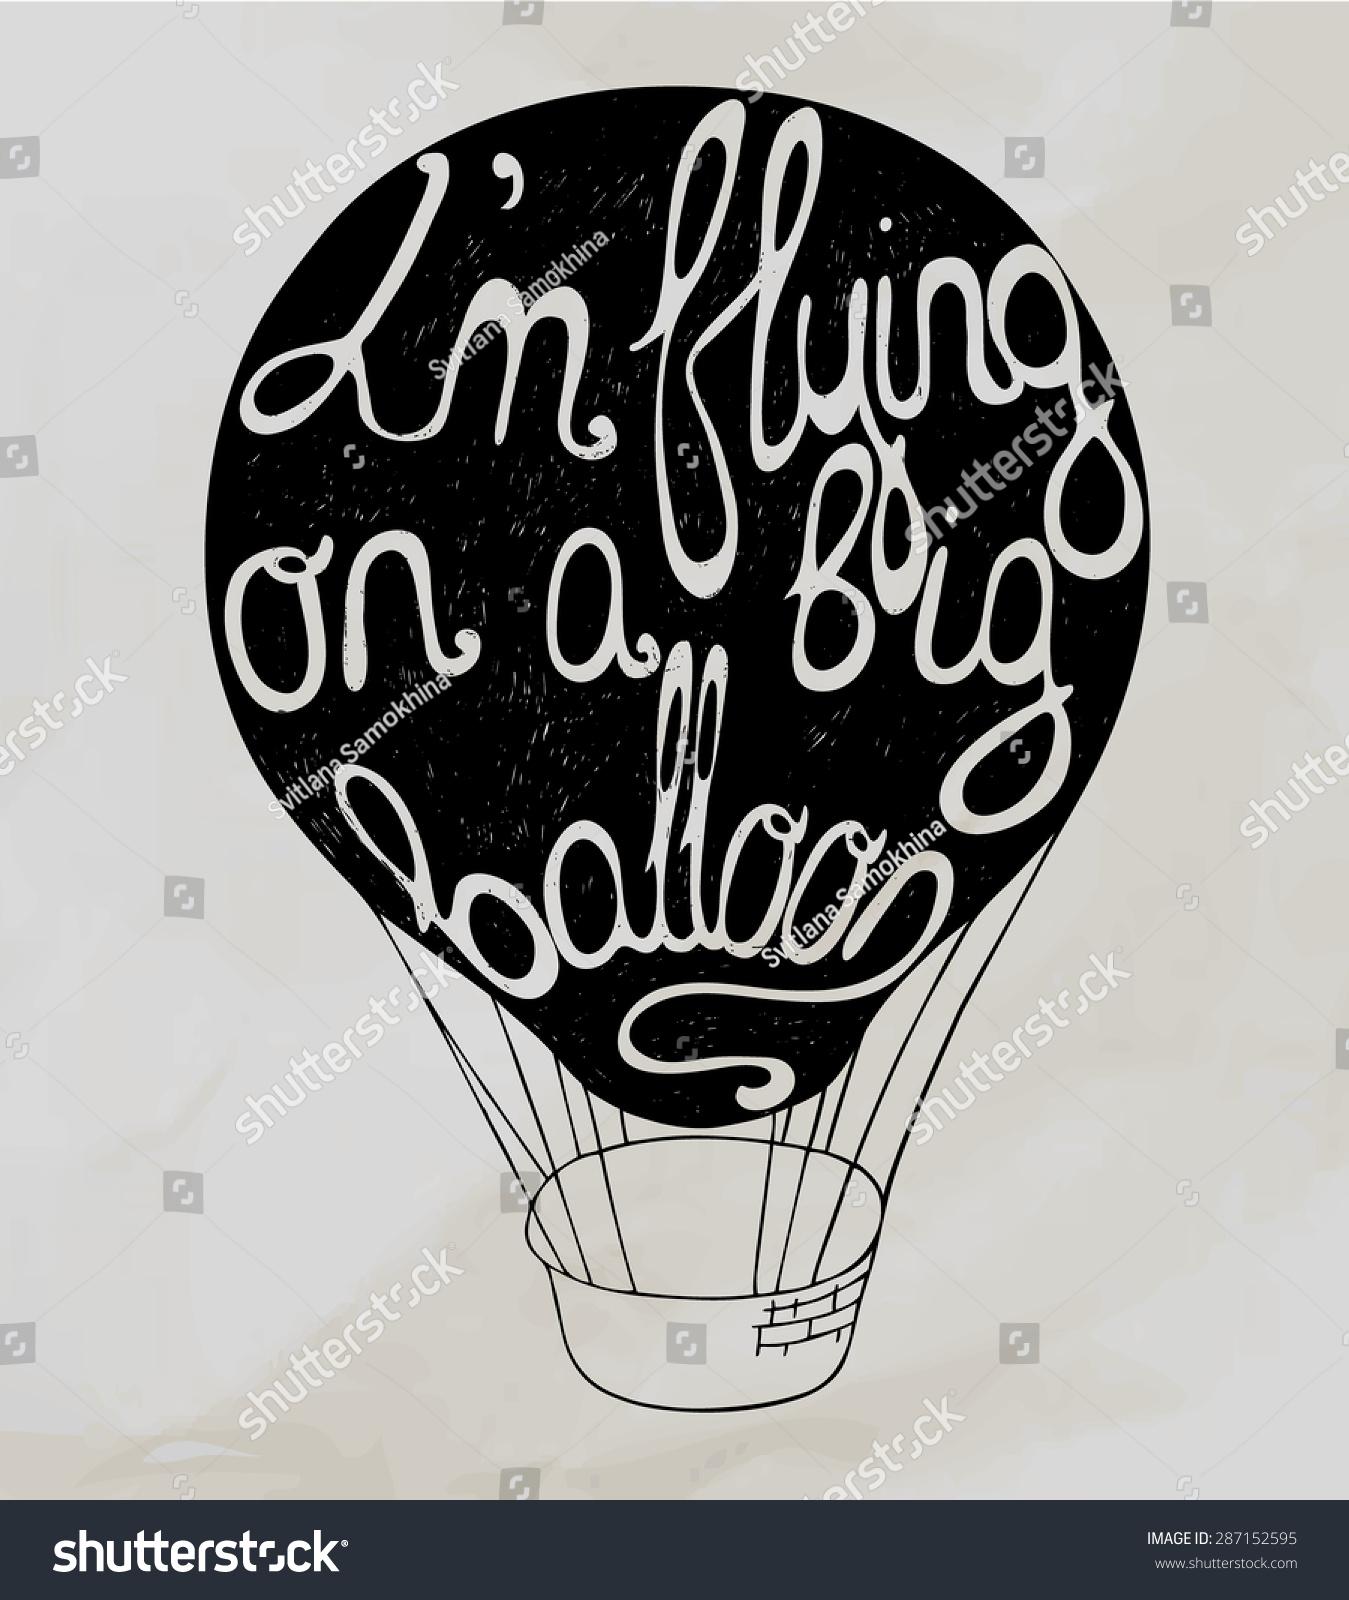 Retro Hot Air Balloon Sky On Stock Vector 287152595 - Shutterstock